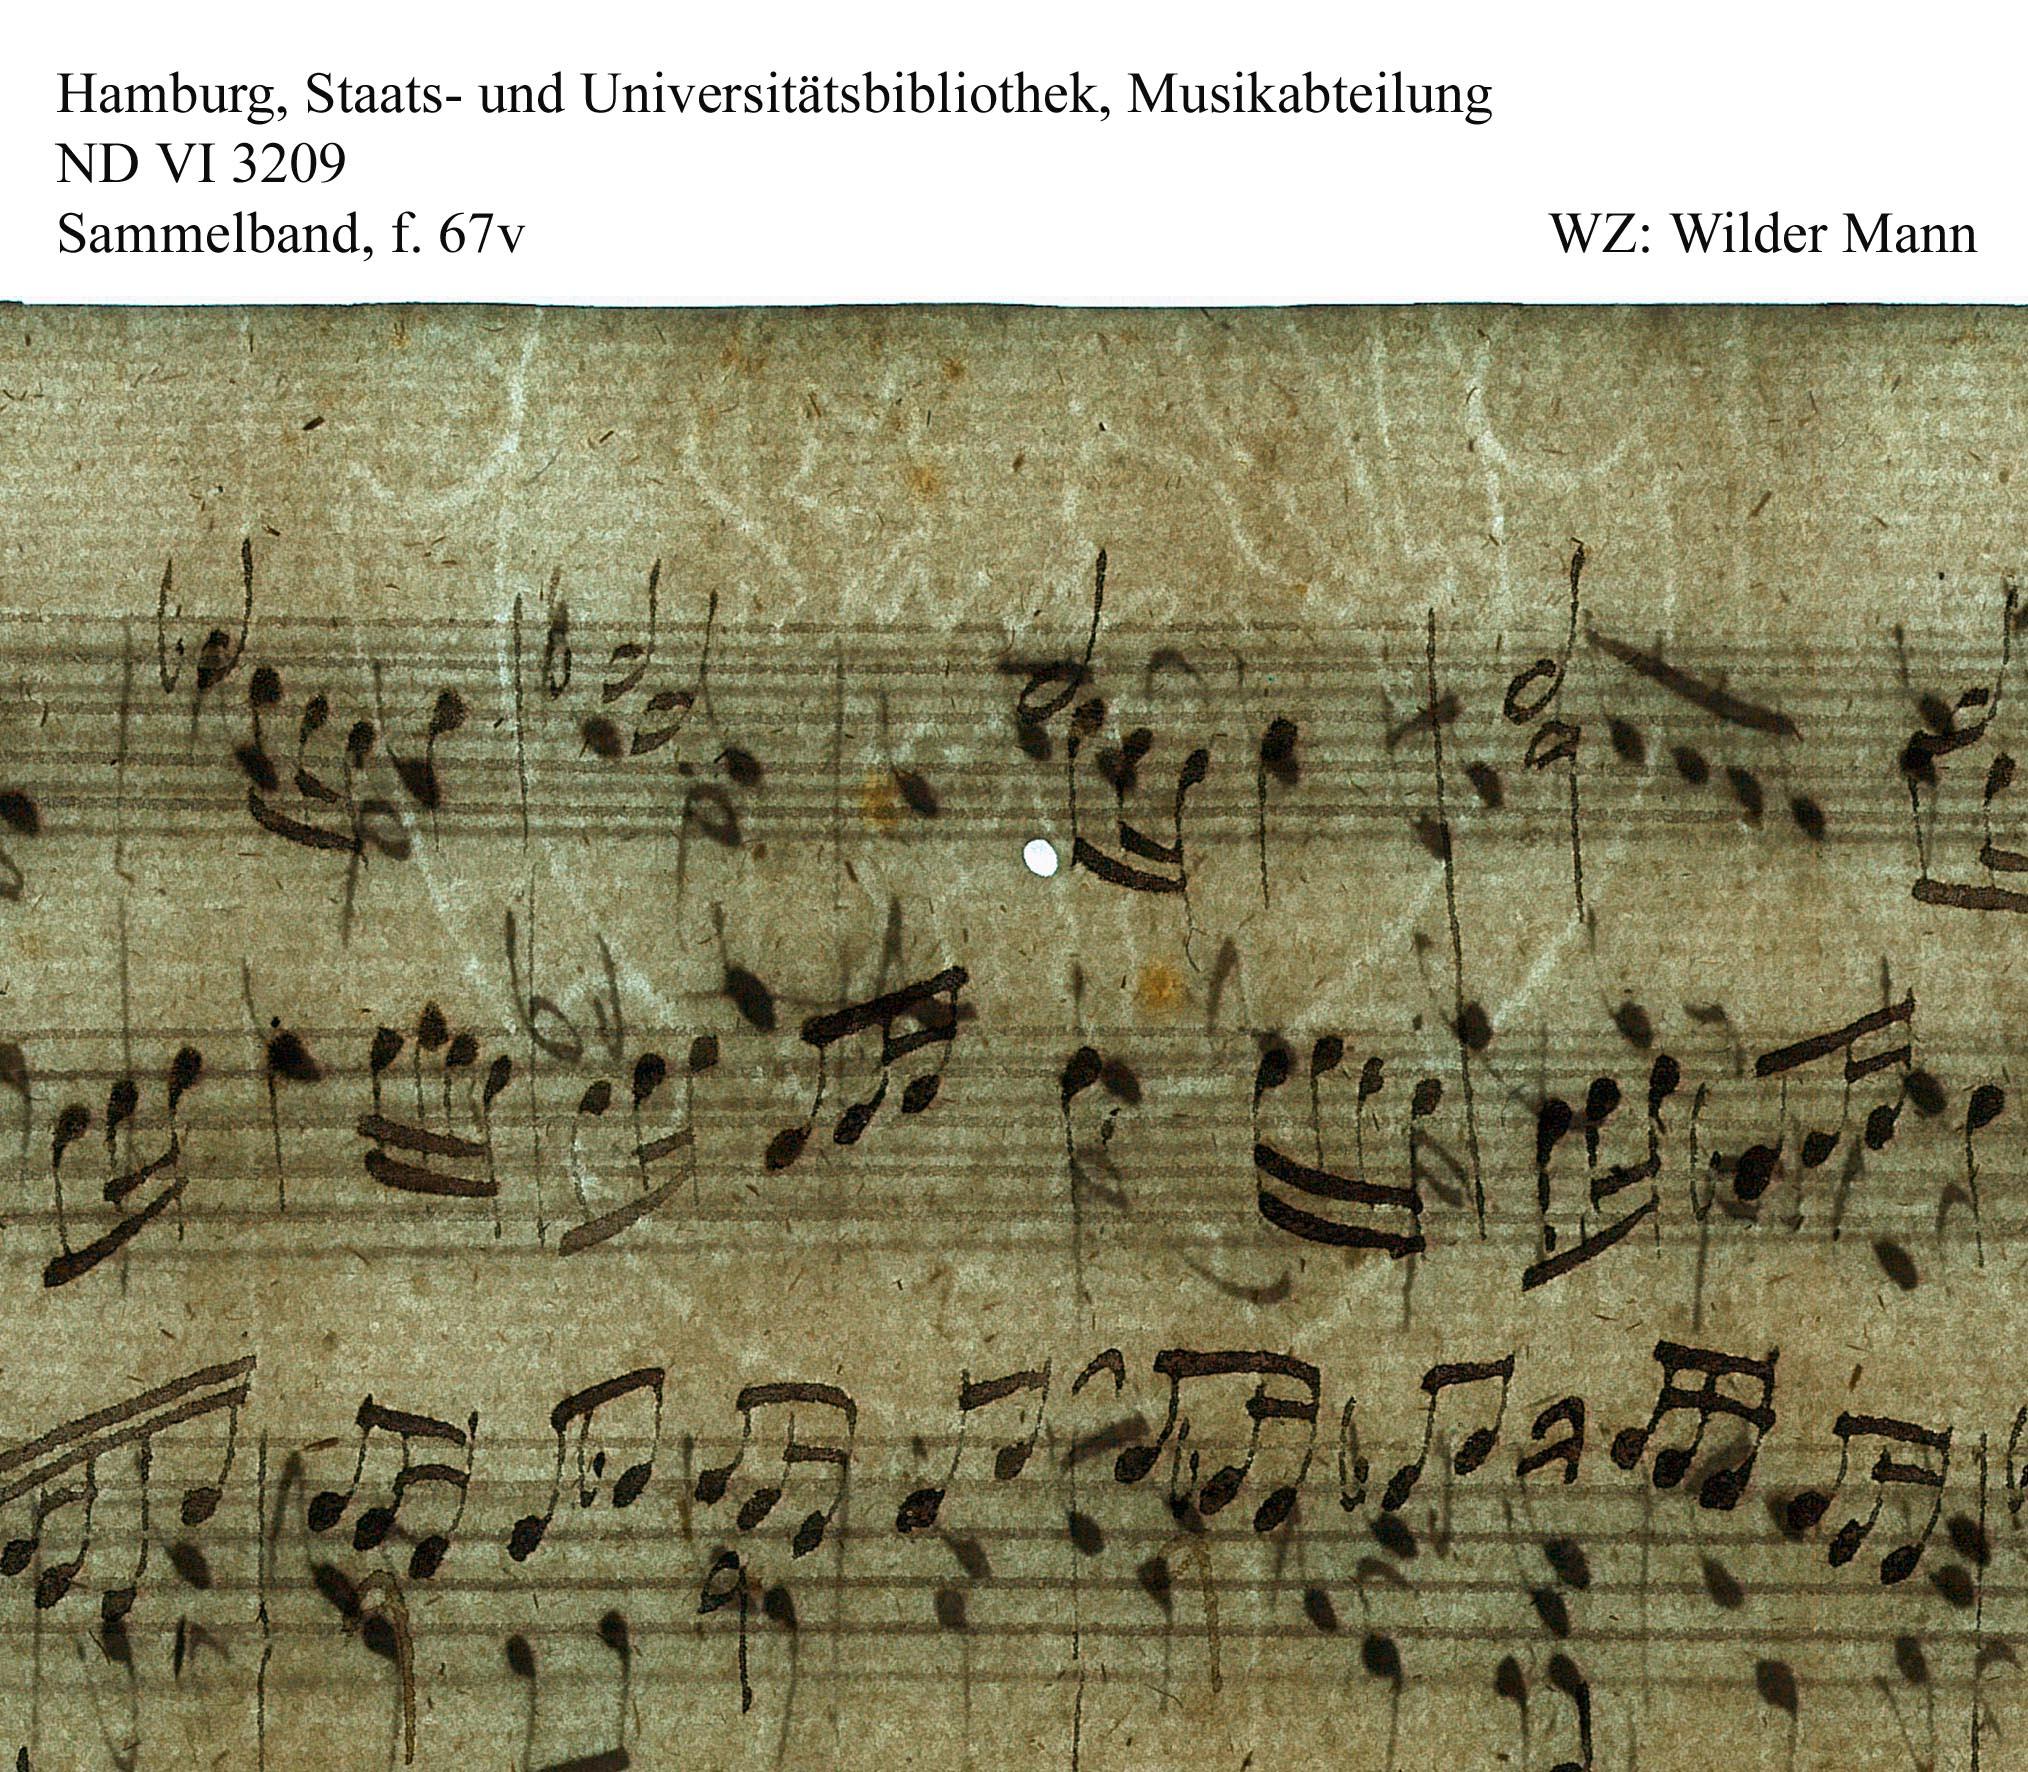 Bach digital: Wilder Mann dhs13